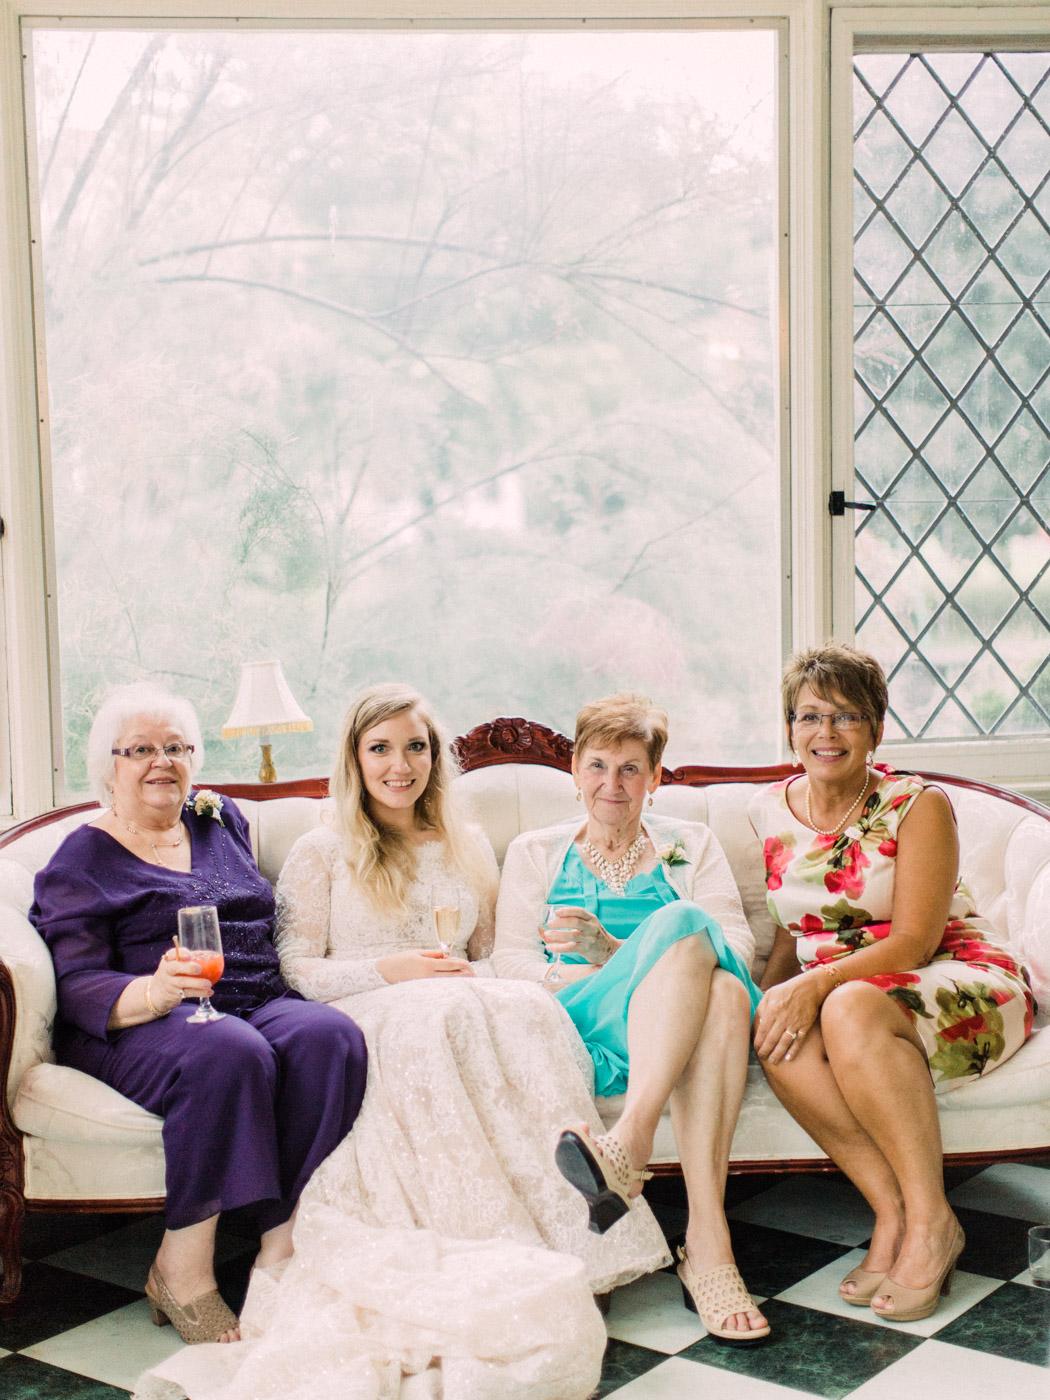 Toronto-wedding-photographer-intimate-classic-fine-art-elopement-ottawa76.jpg